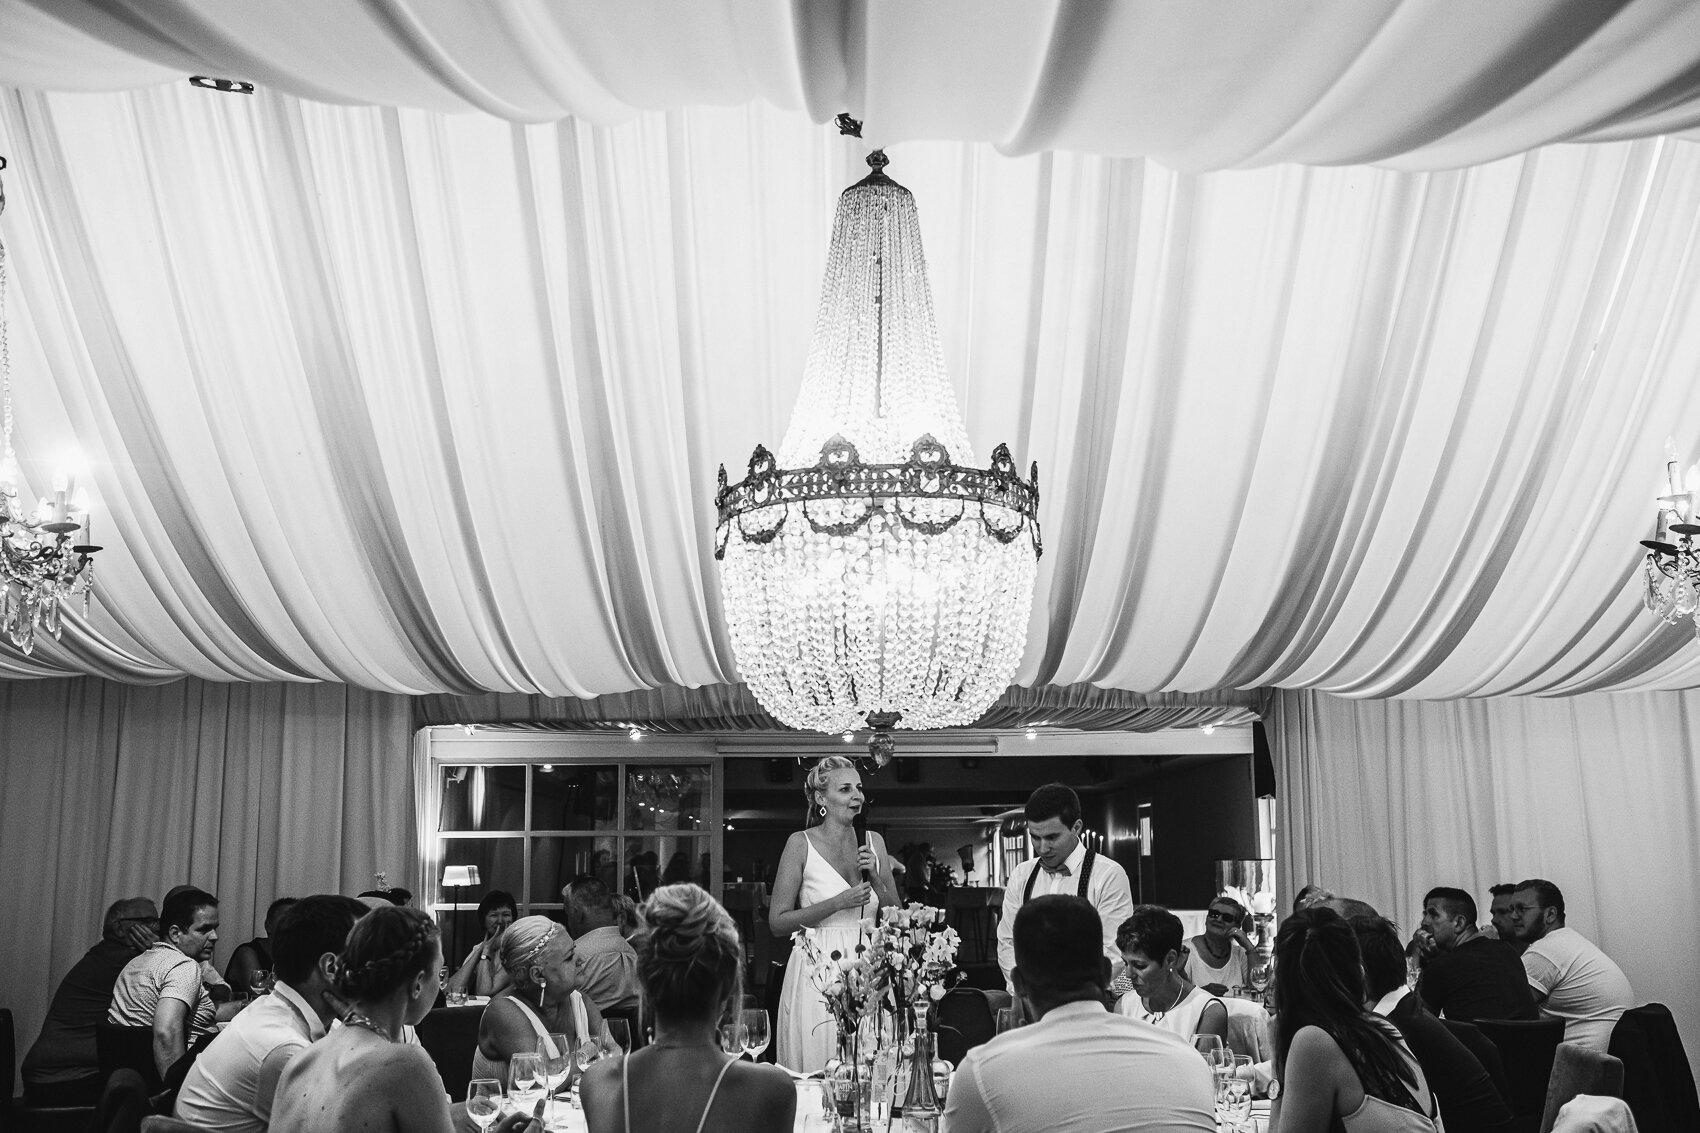 iso800 - huwelijksfotograaf isabo matthias verbeke foundation-30.jpg